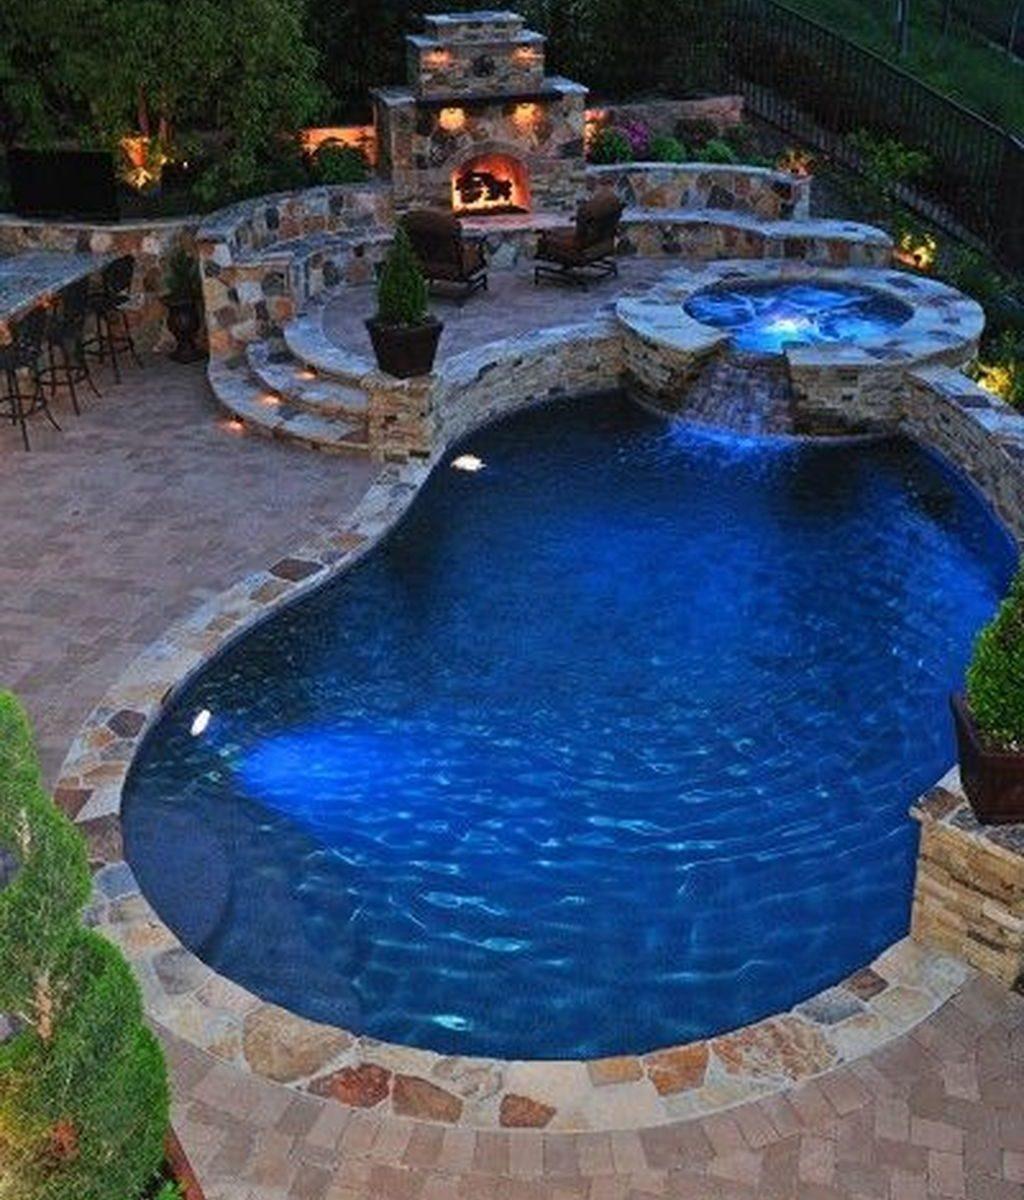 Fabulous Backyard Pool Landscaping Ideas You Never Seen Before 32